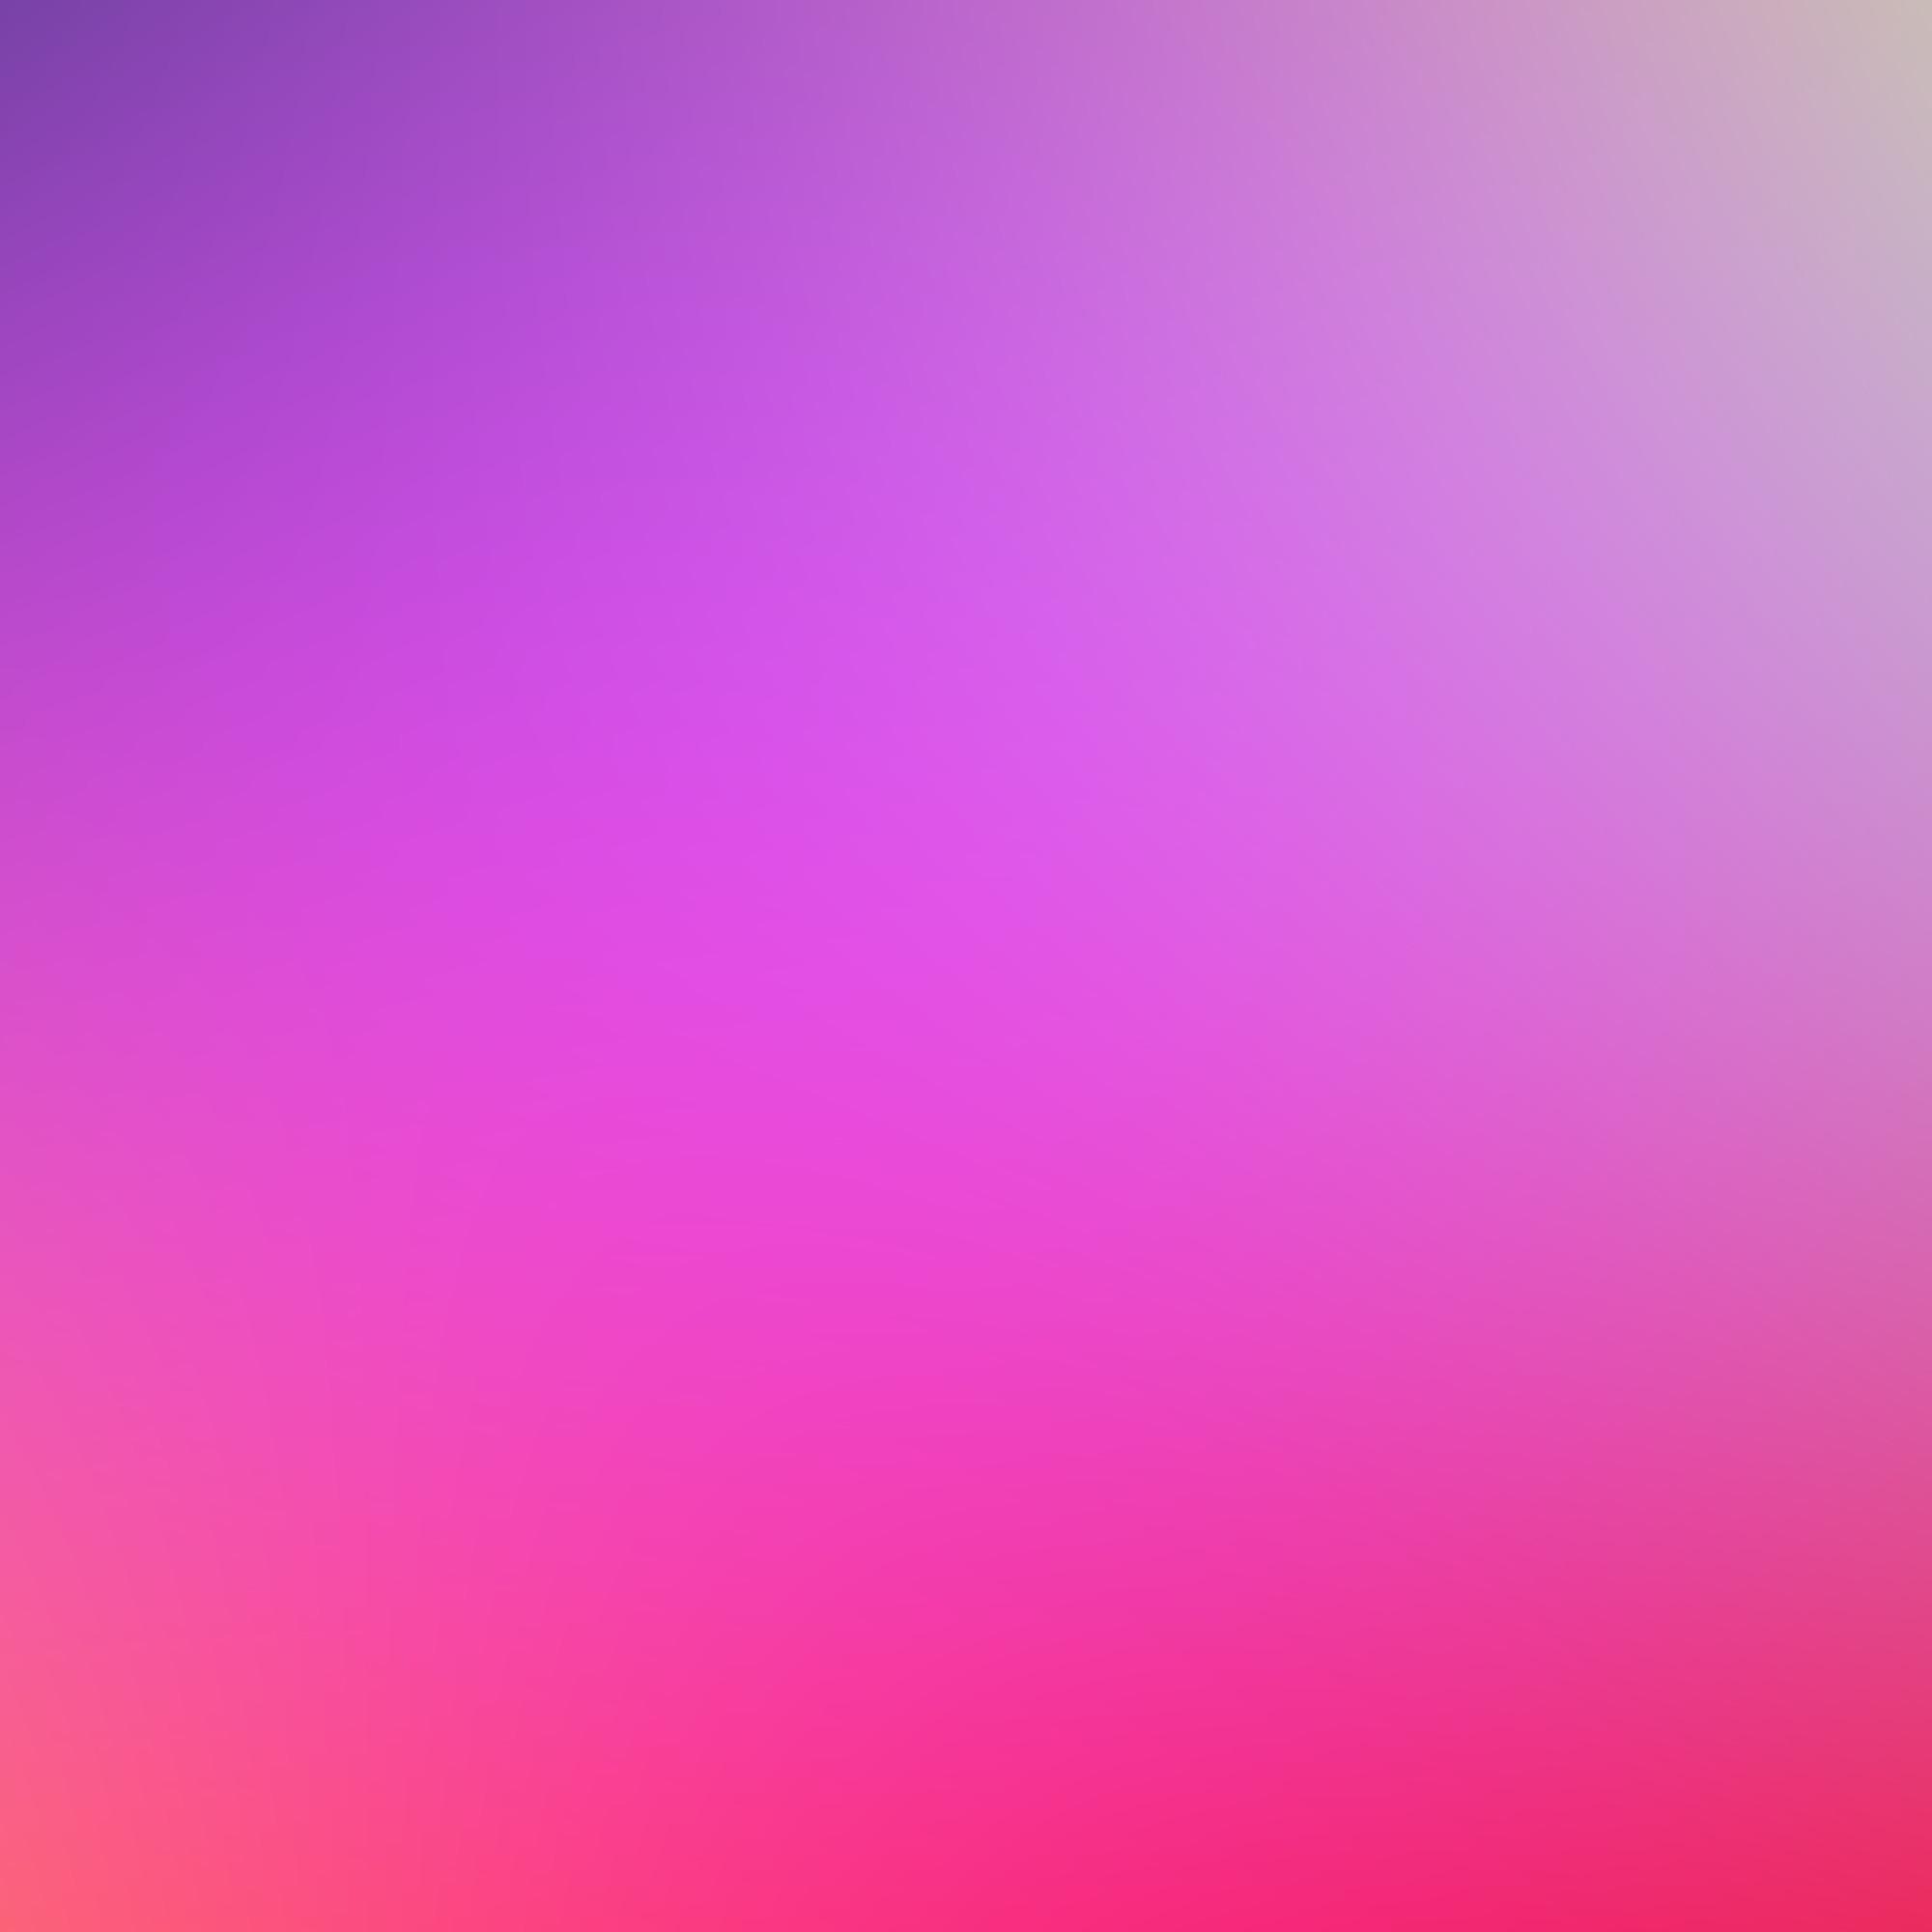 Pink Color Pink Wallpaper (68+ Images